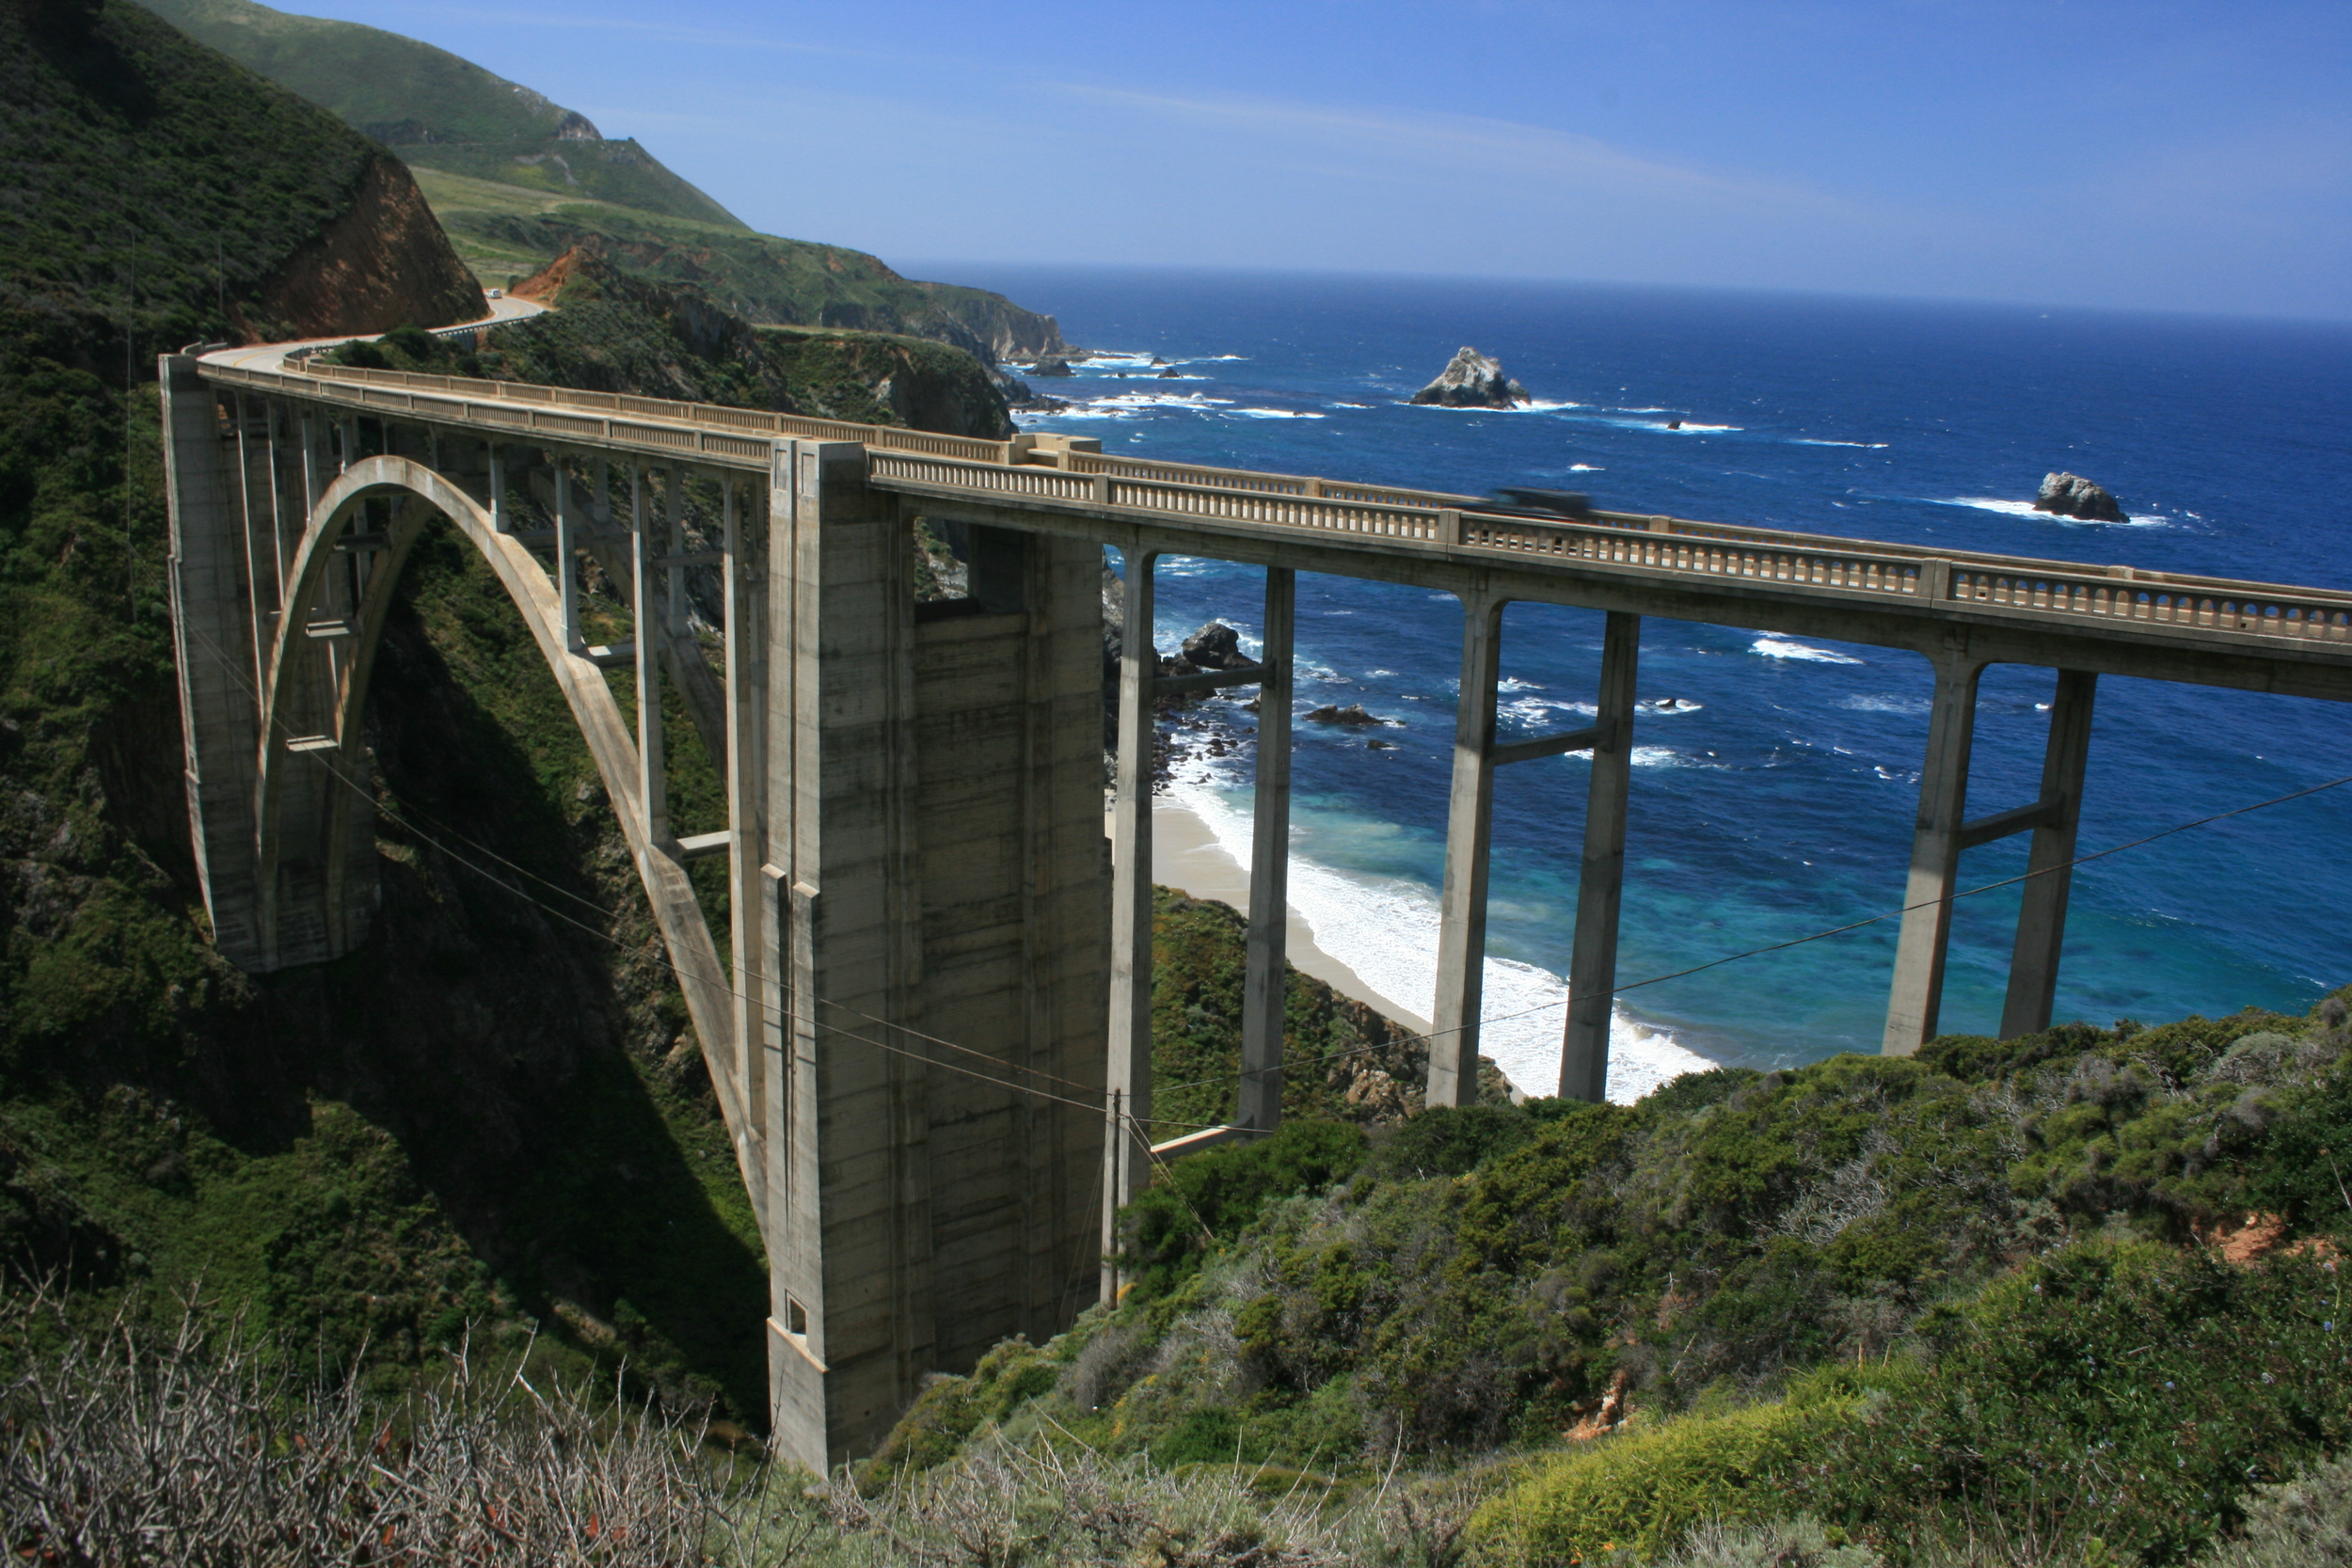 Bixby_Creek_Bridge,_The_Big_Sur,_California ian mcwilliams.jpg